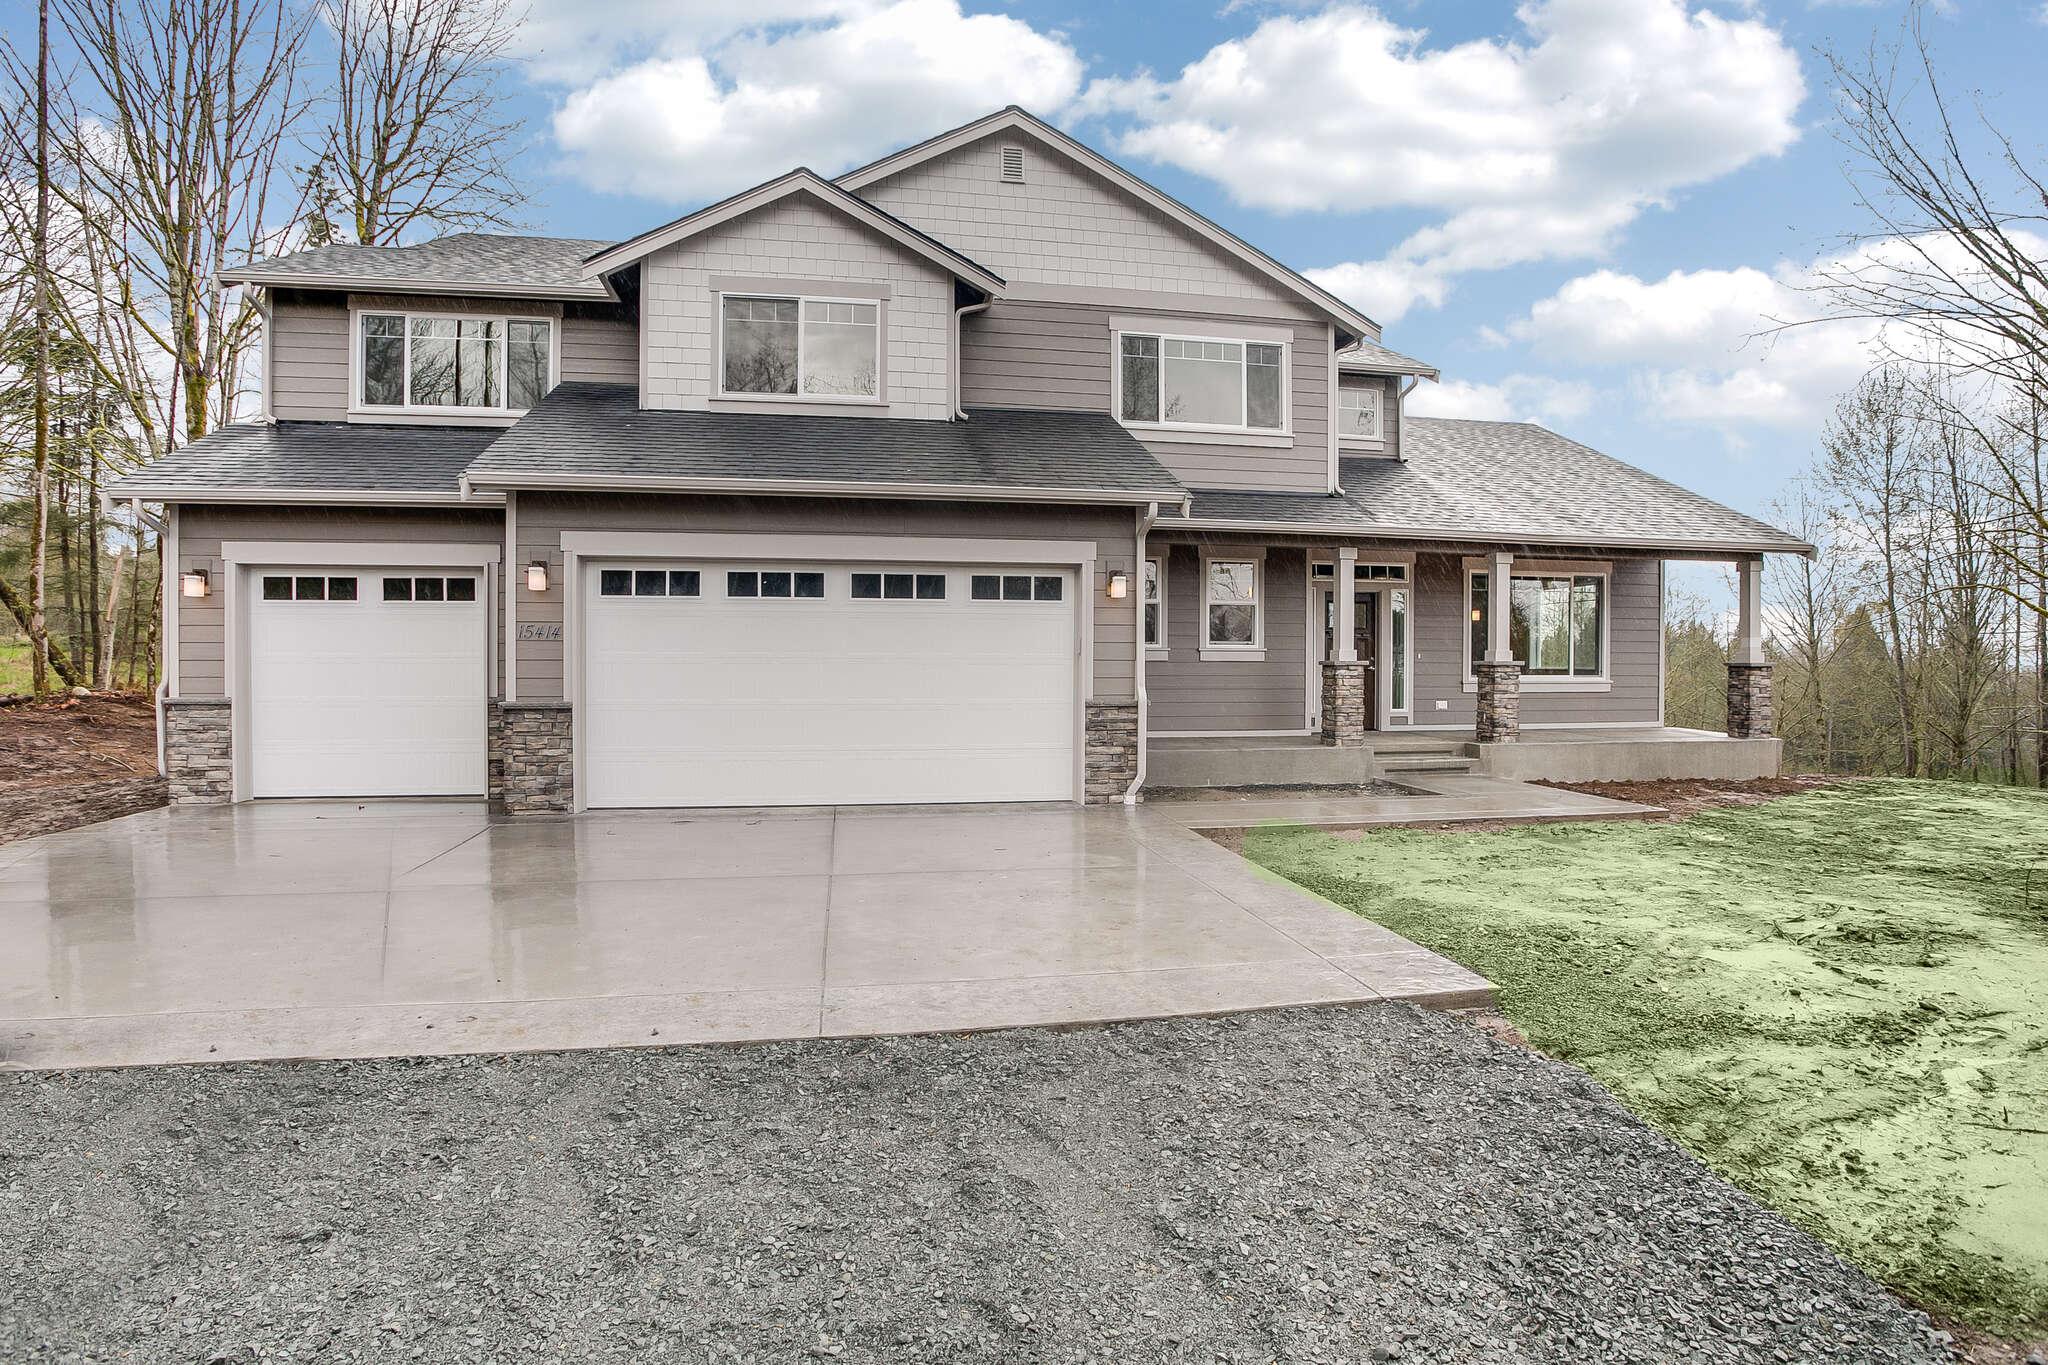 New Construction for Sale at 15414 72nd St Se110 Snohomish, Washington 98290 United States